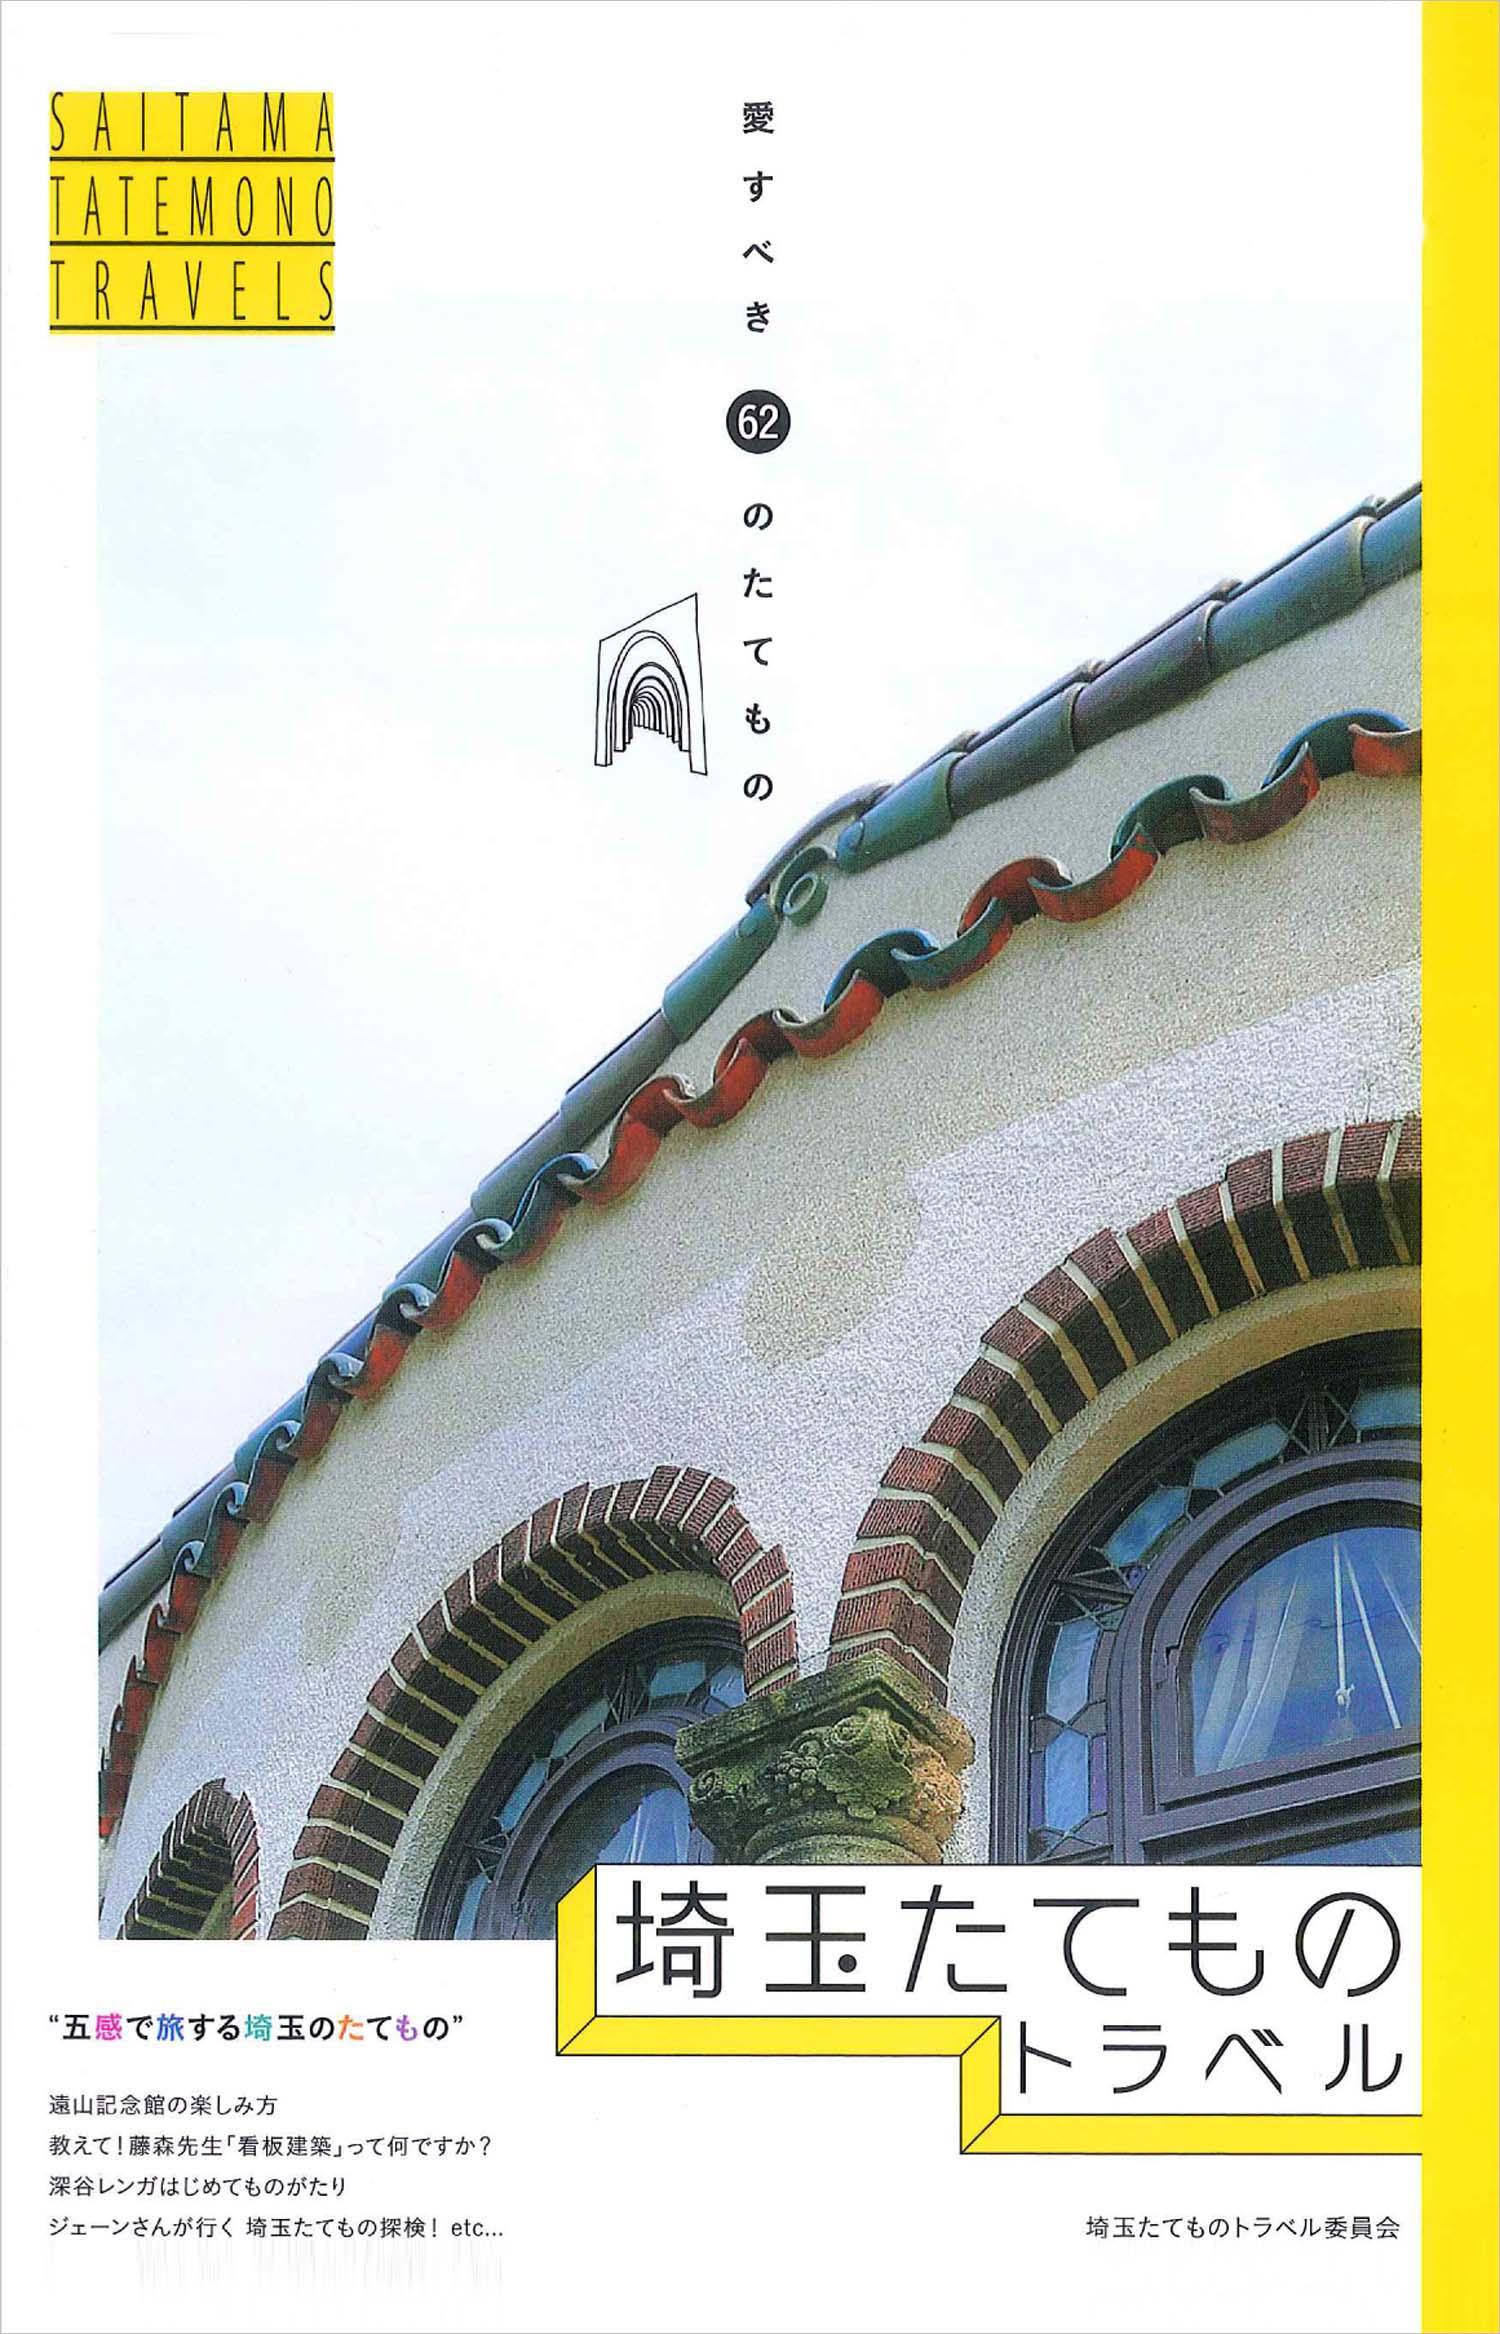 Sugamo Shinkin Bank / Nakaaoki<br>Sugamo Shinkin Bank / Niiza